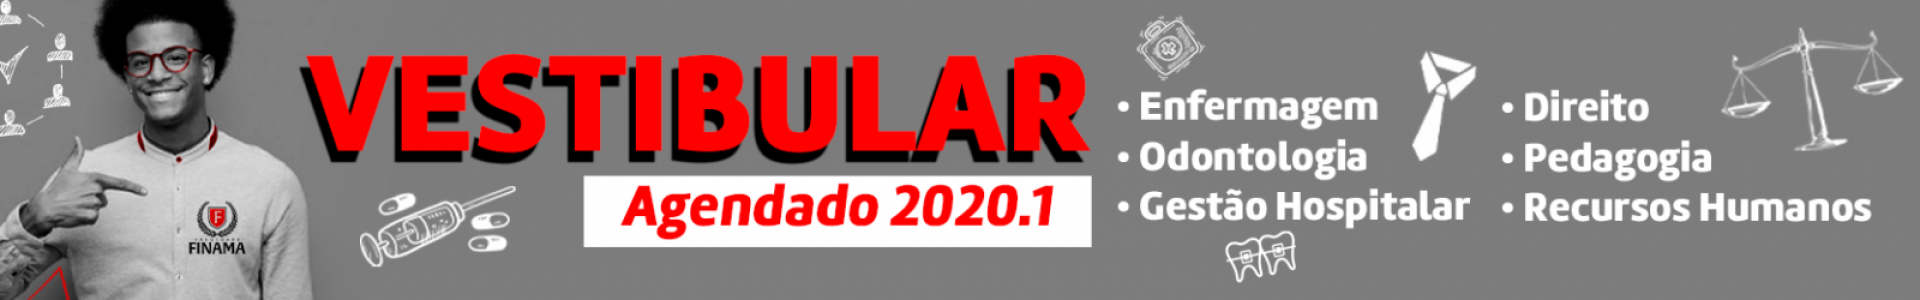 Vestibular Agendado Finama